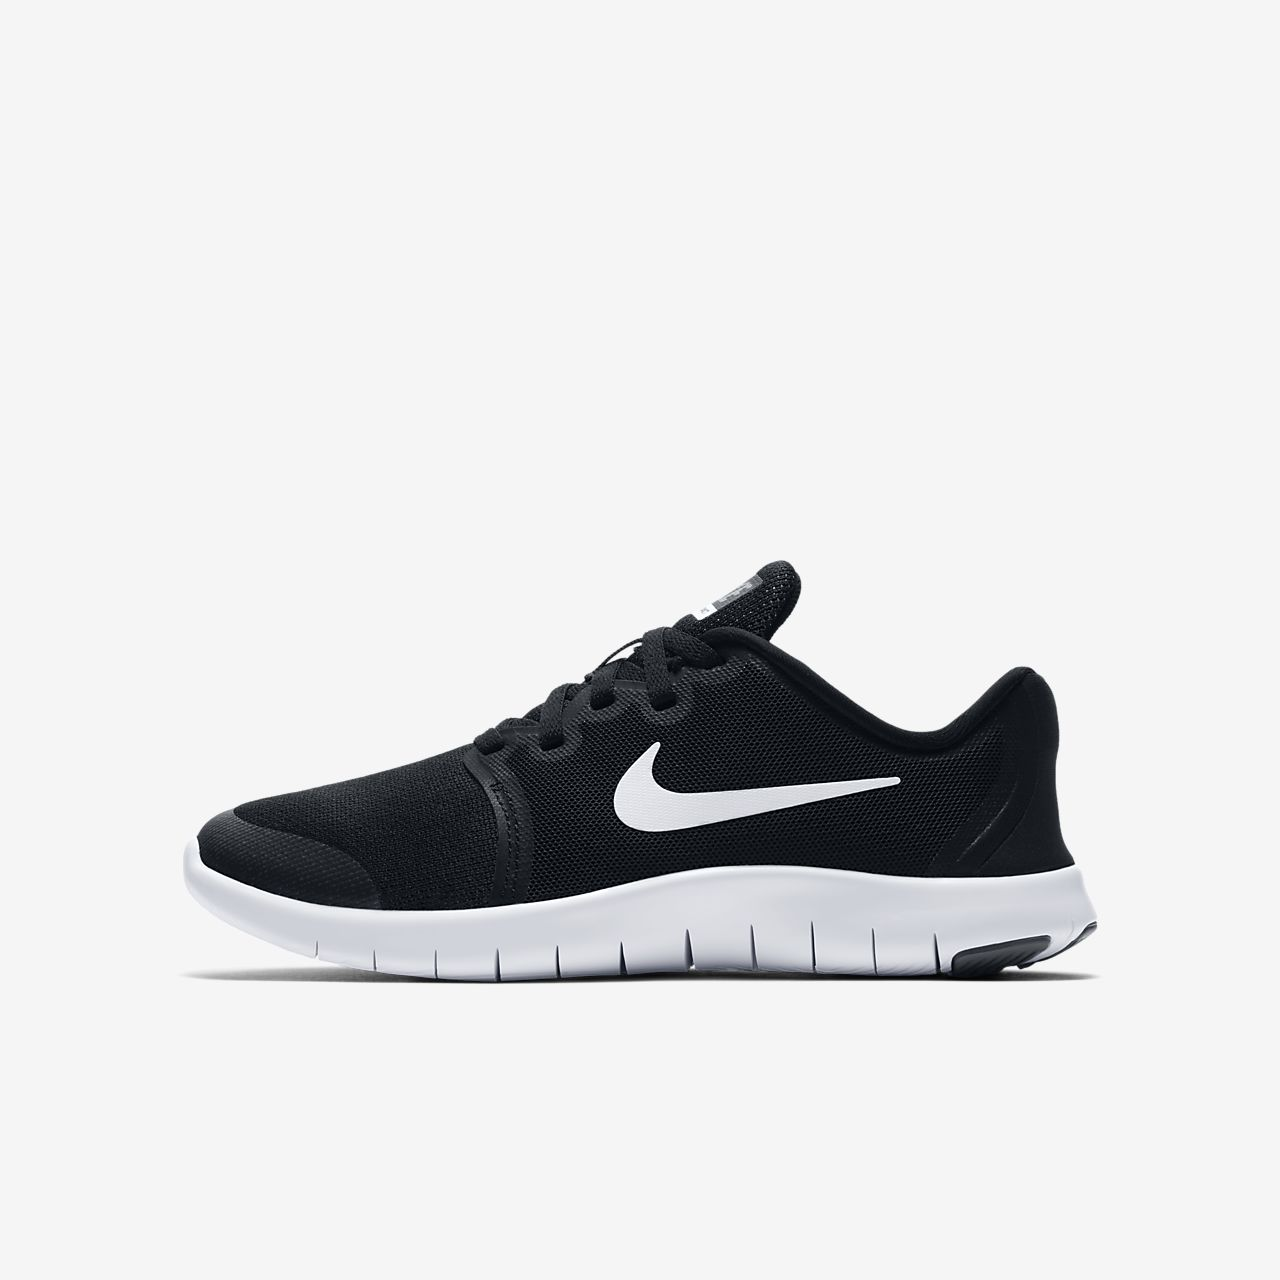 Löparsko Nike Flex Contact 2 för ungdom